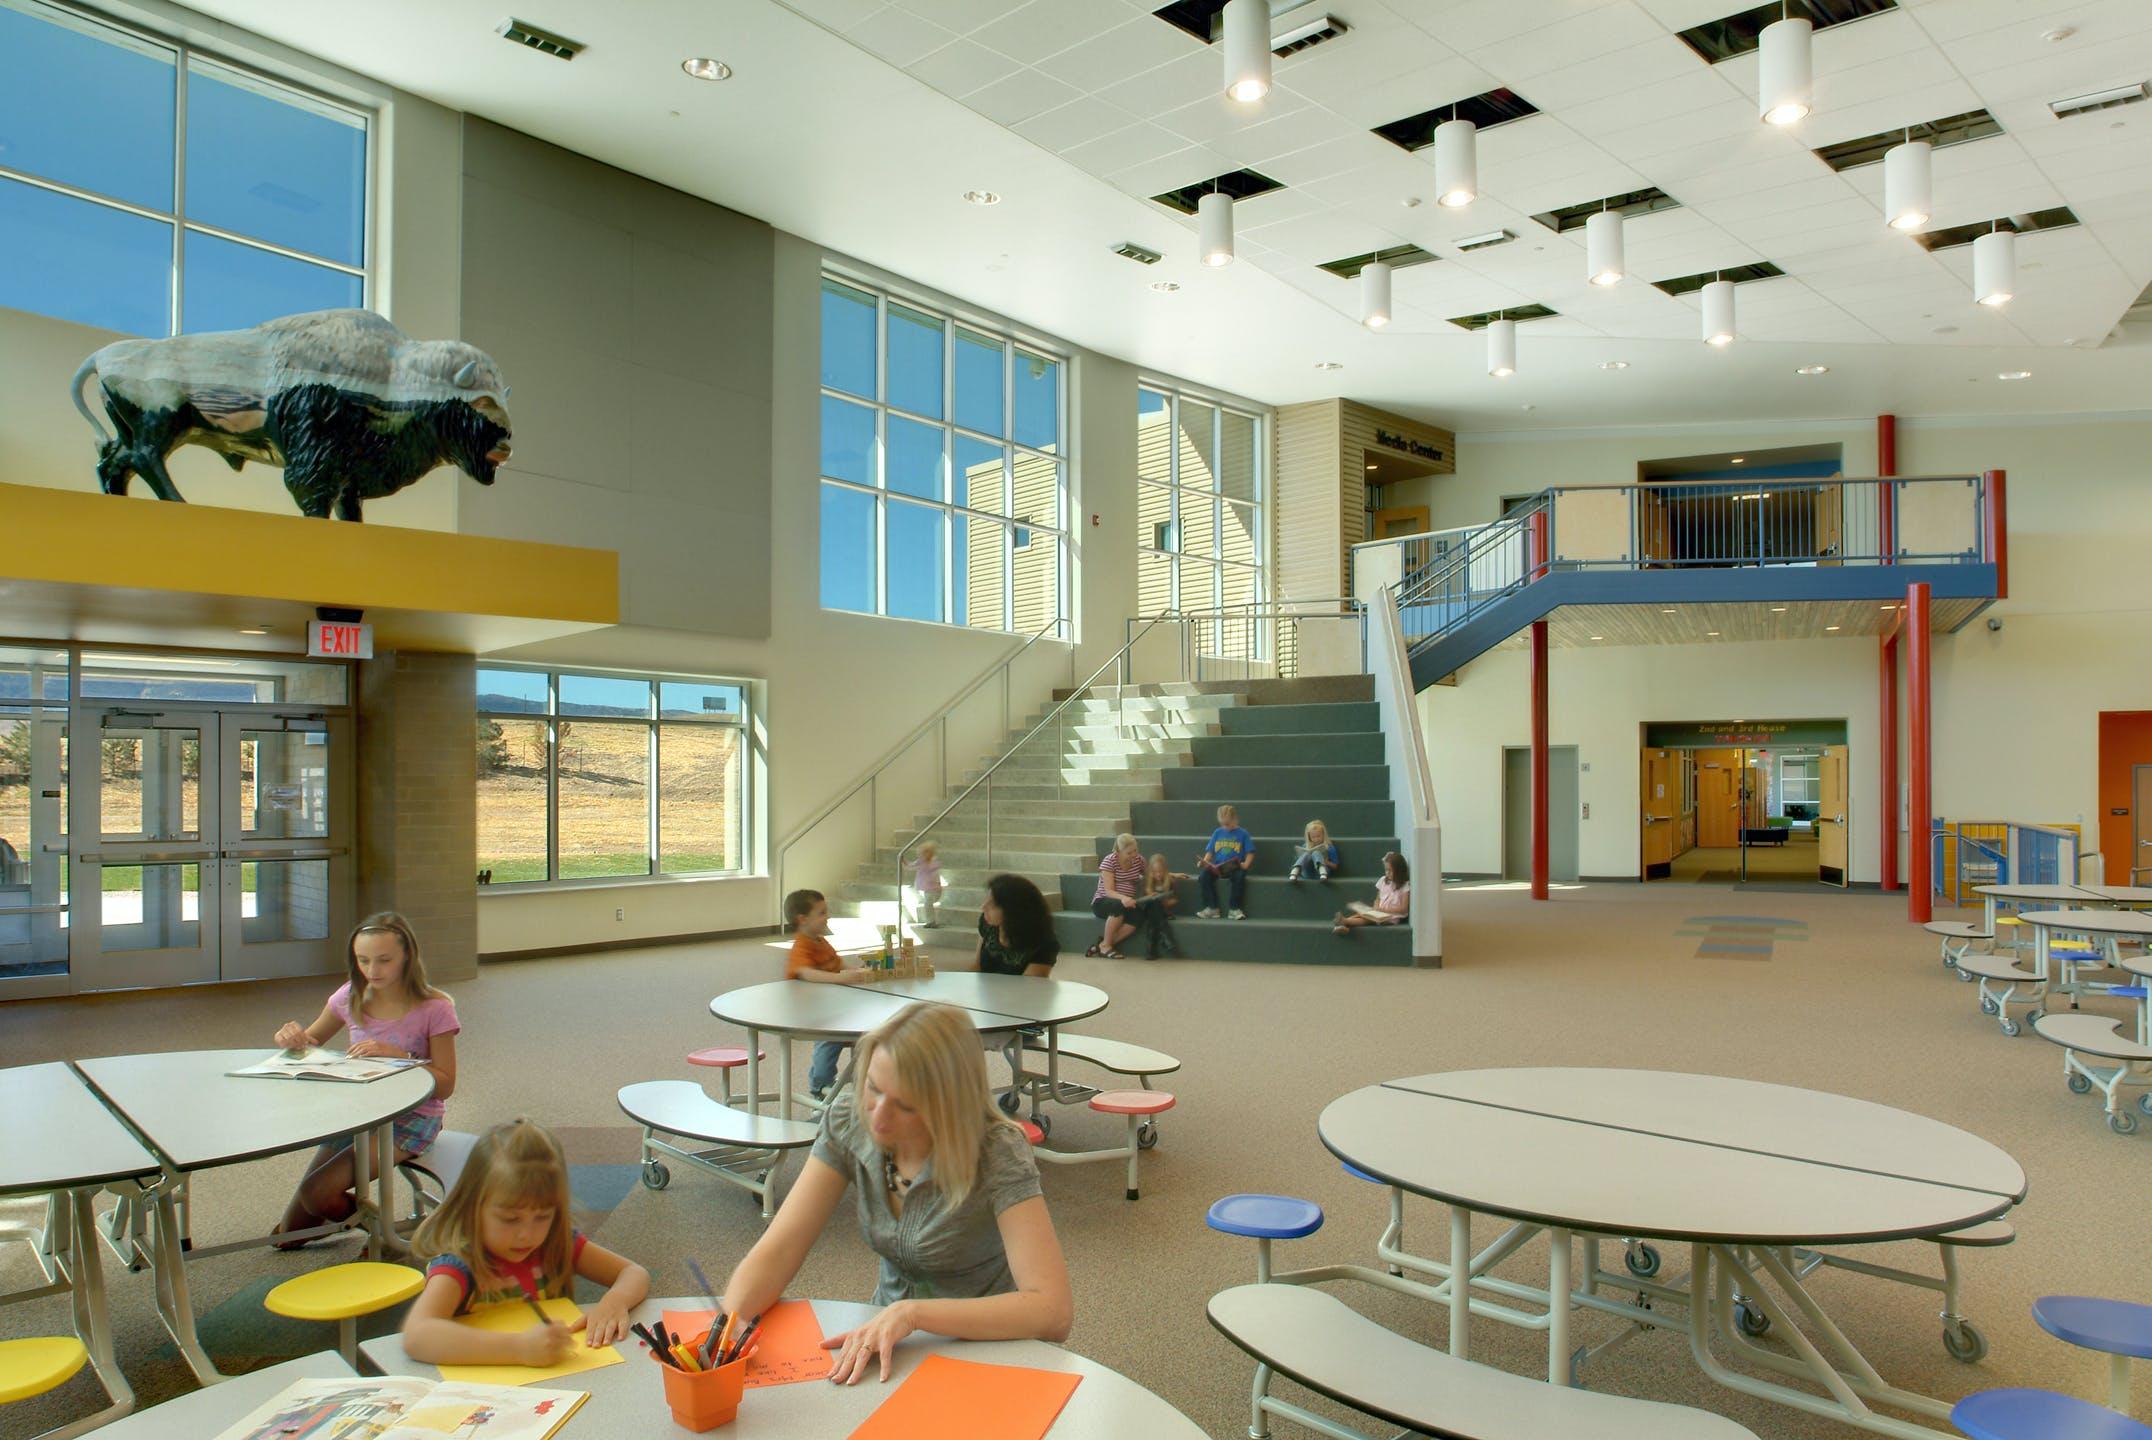 Summit Elementary School Lee H Skolnick Architecture Design Partnership Archinect